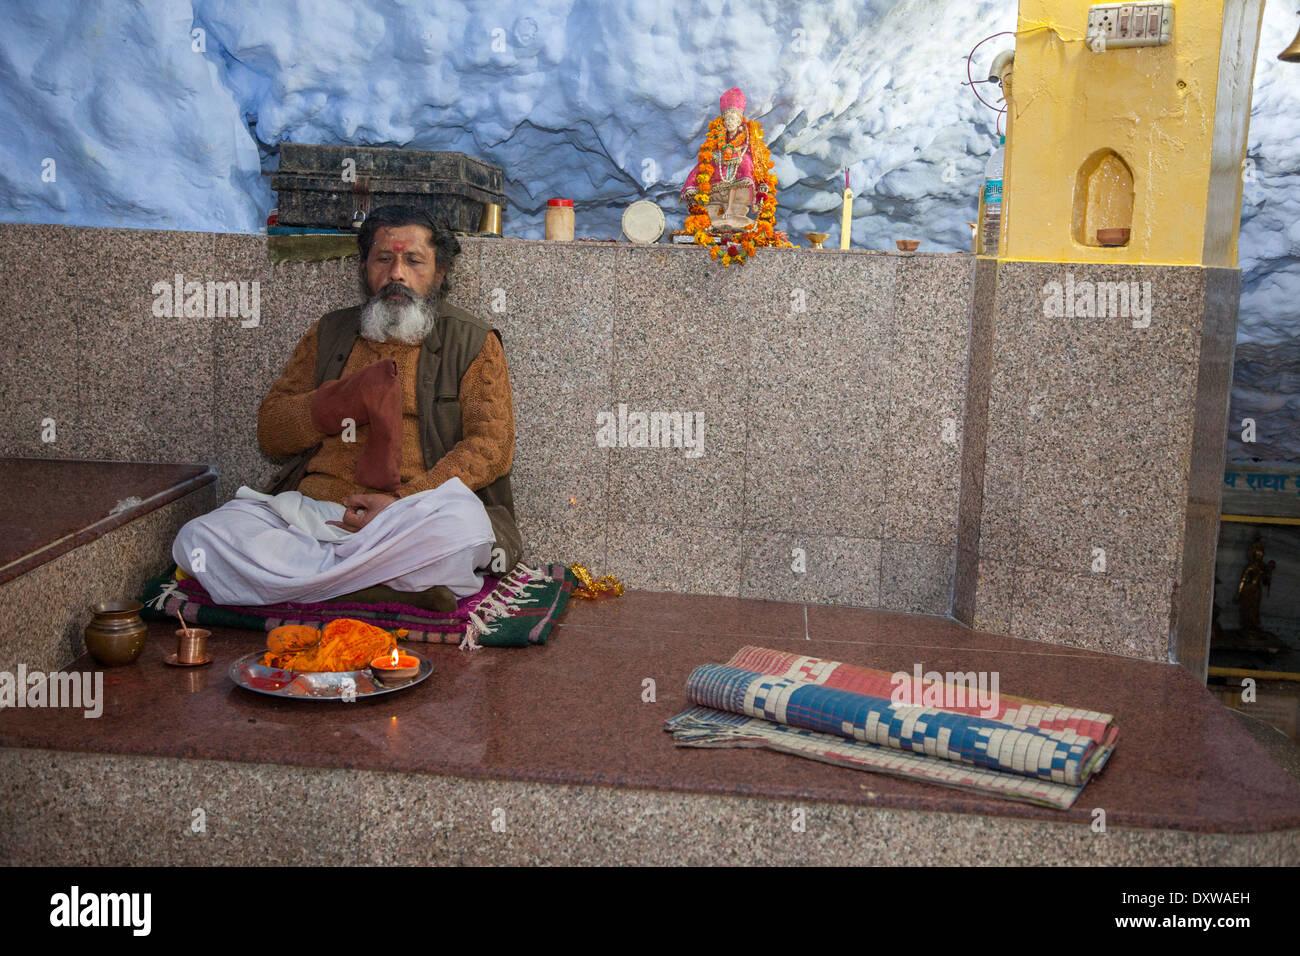 India, Dehradun. Hindu Sadhu (Holy Ascetic) in the Tapkeshwar Hindu Temple. Stock Photo